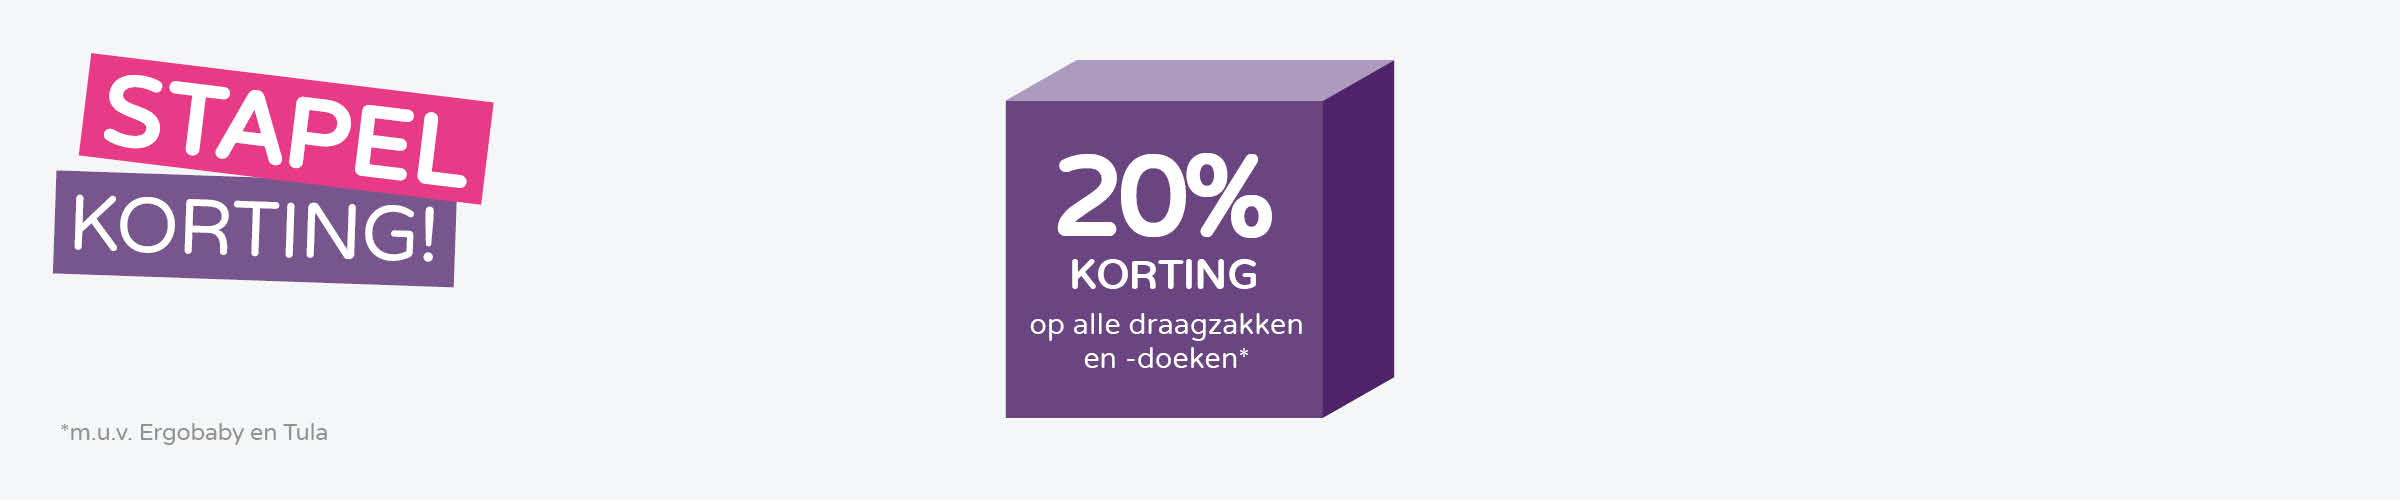 e5c0d06f3ed Prenatal.nl - Draagzakken & Draagdoeken online bestellen